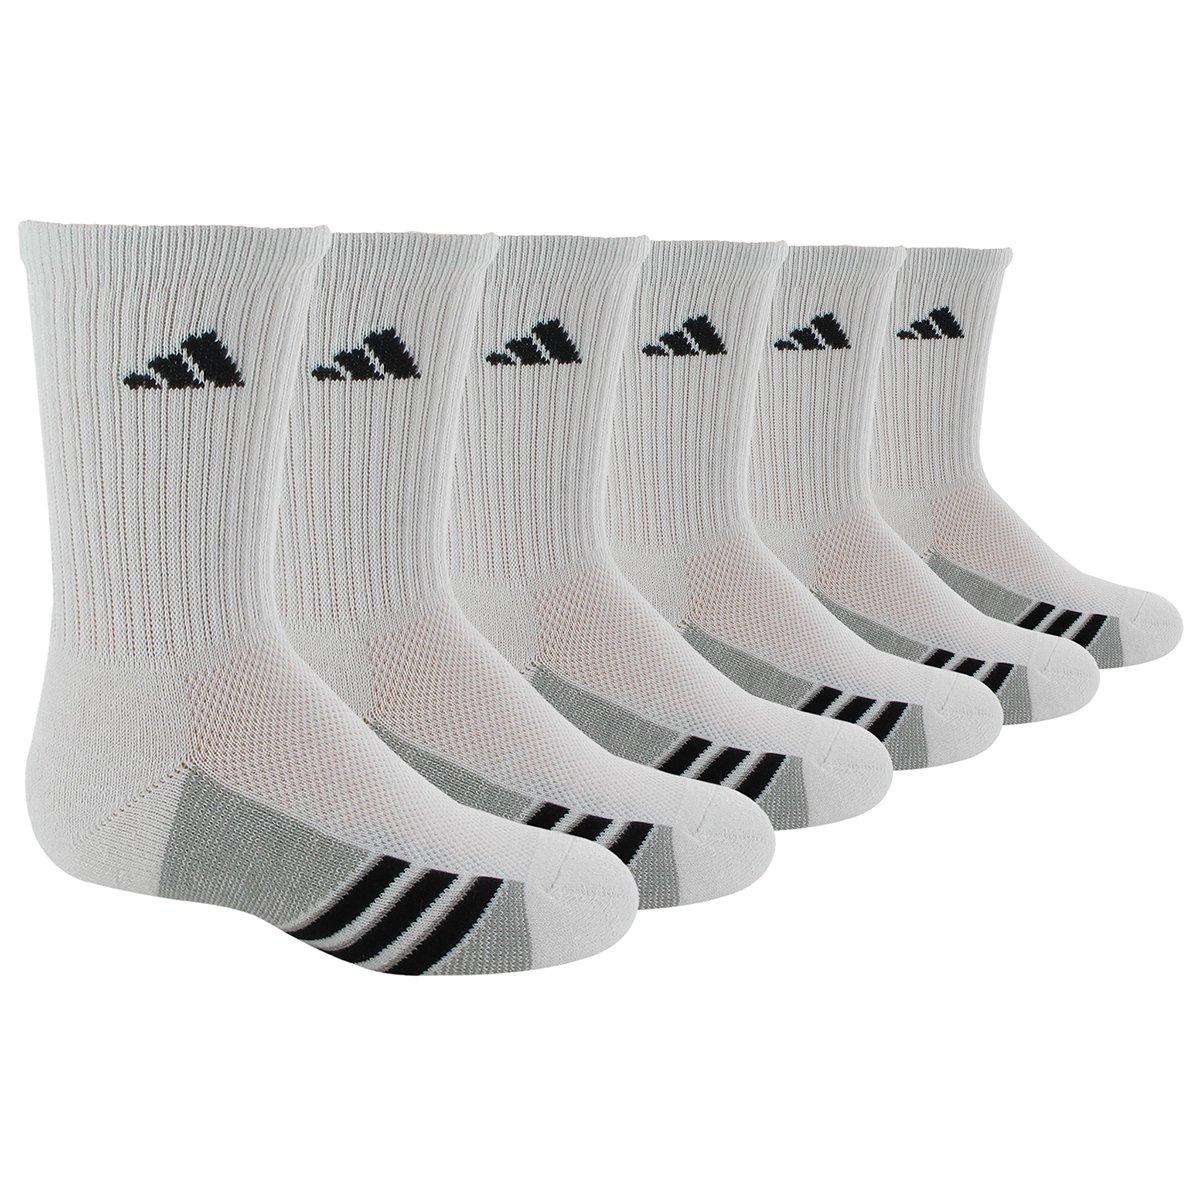 adidas Boys' Graphic 6-Pack Crew (Toddler/Little Big Kid/Adult), White/Black/Aluminum 2, Medium (Shoe Size 13C-4Y)